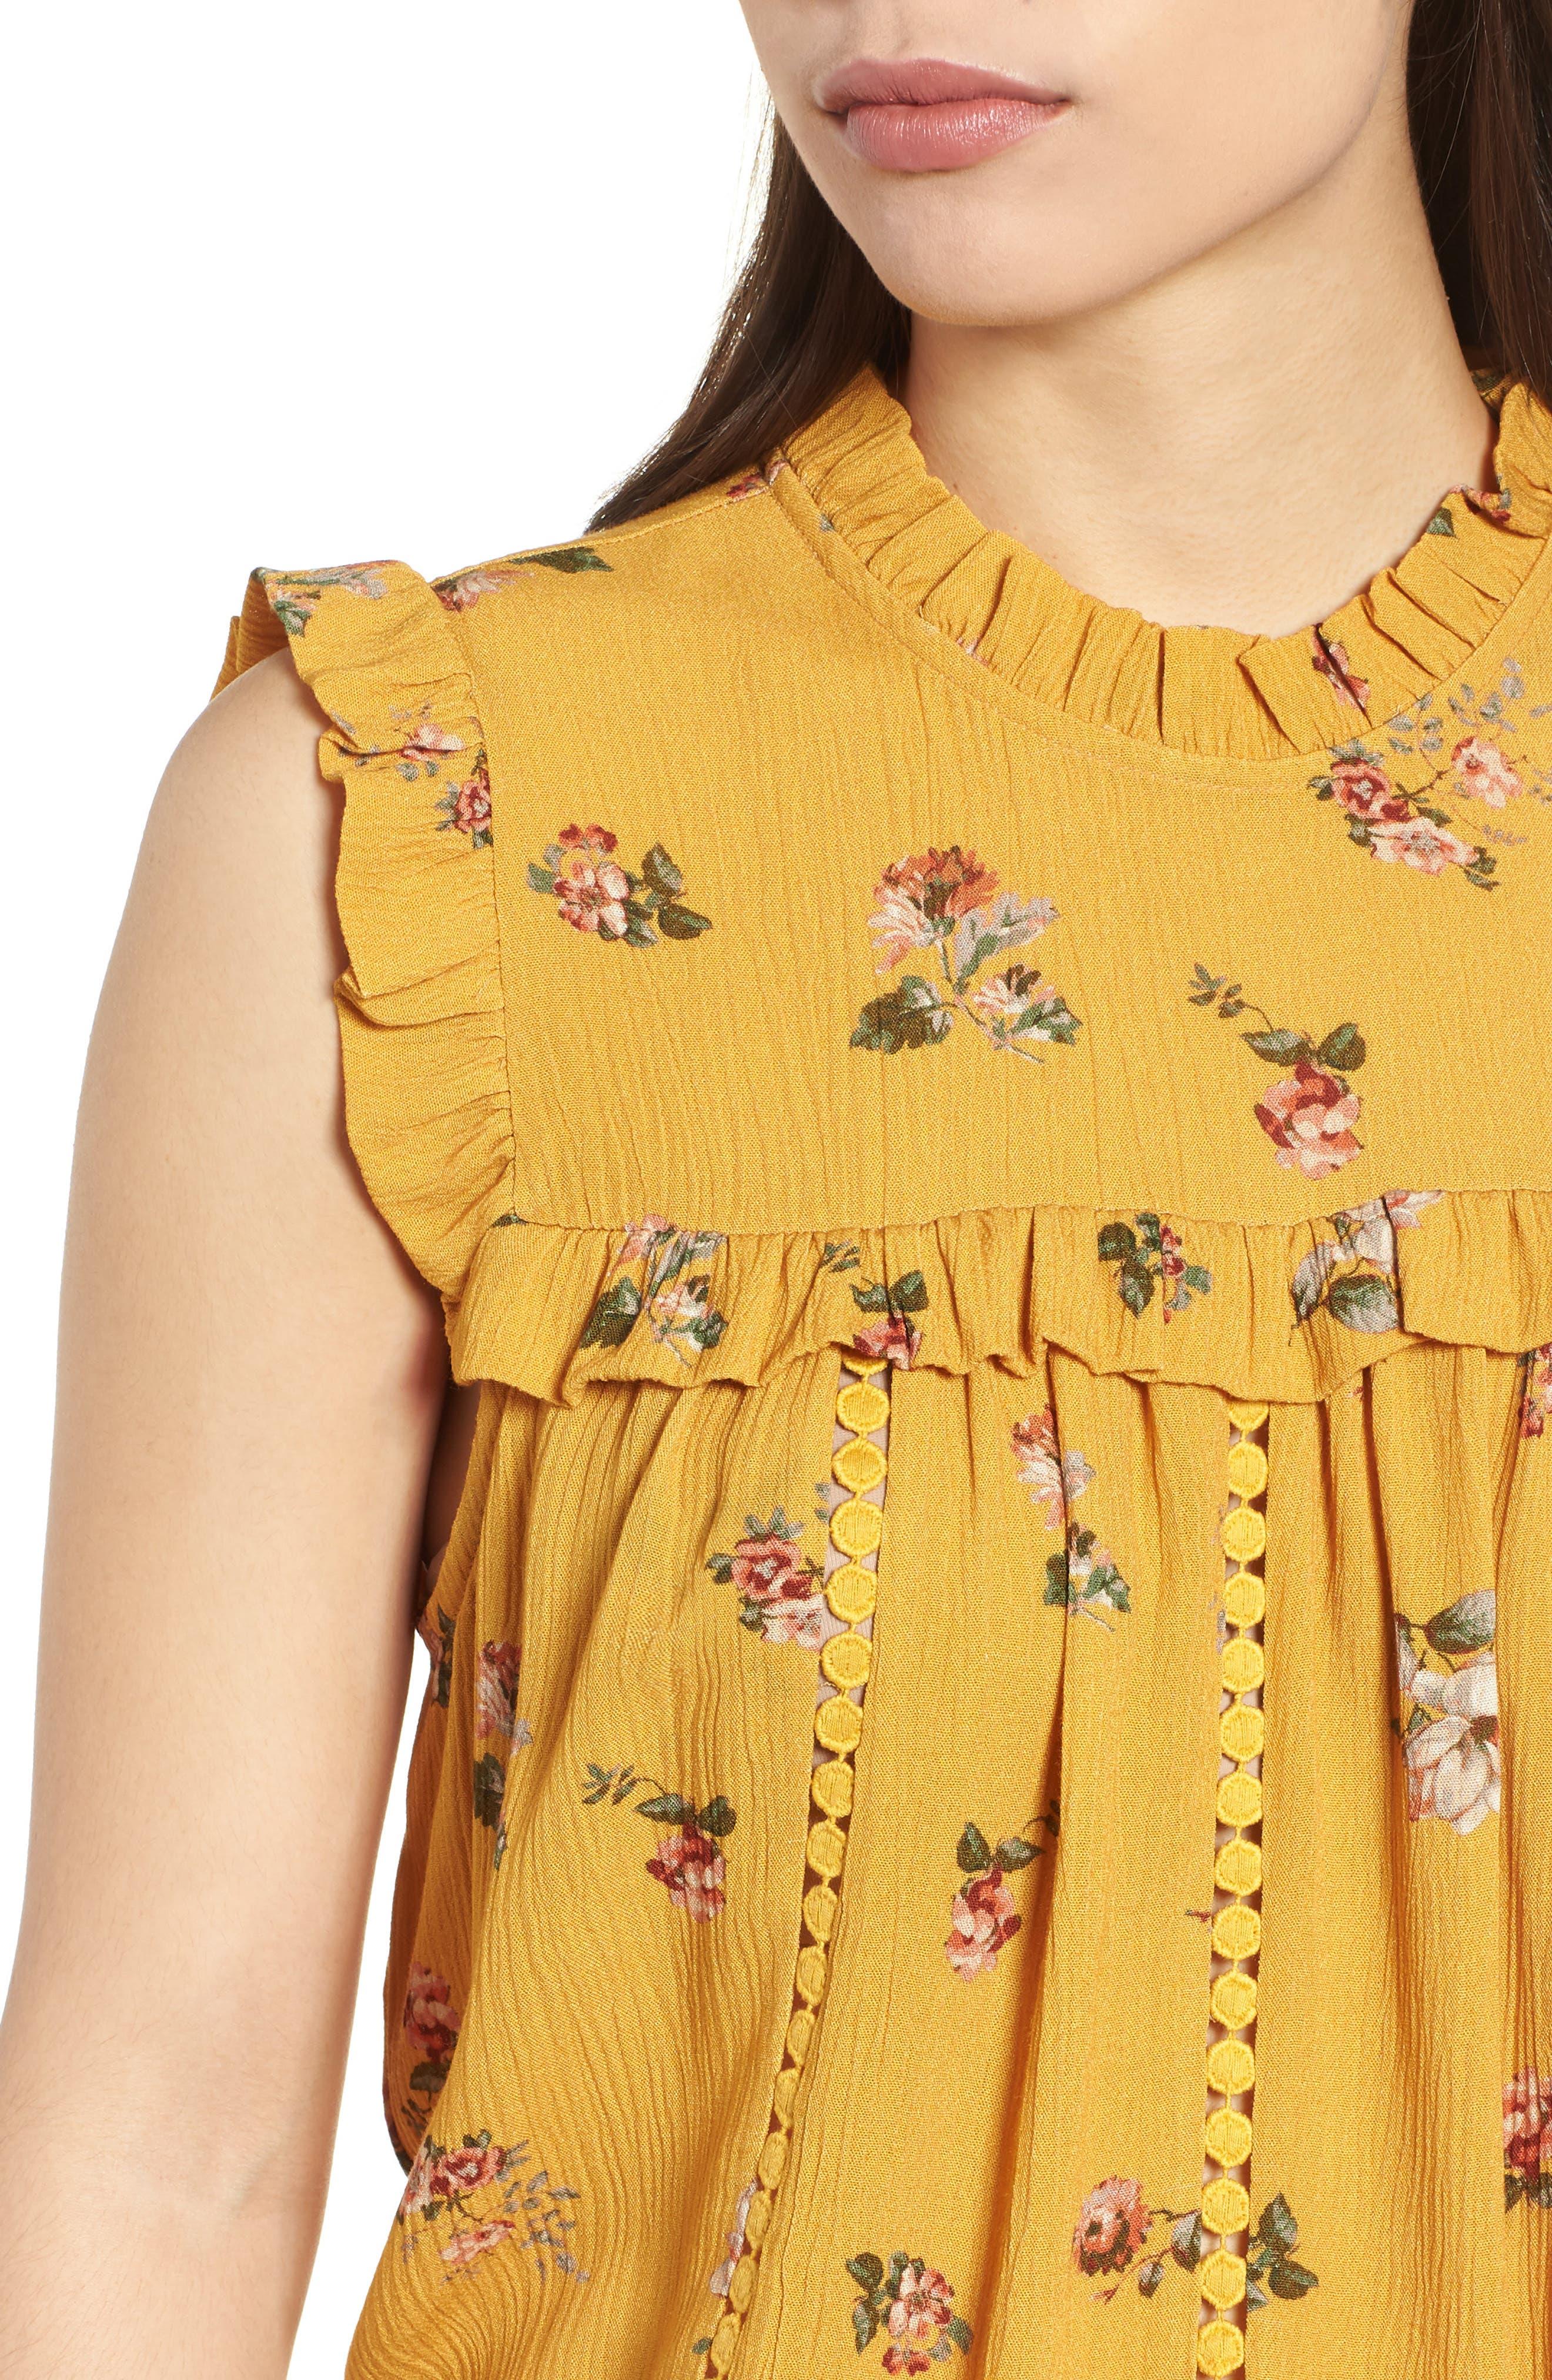 Ruffled Floral Top,                             Alternate thumbnail 4, color,                             Marigold Print